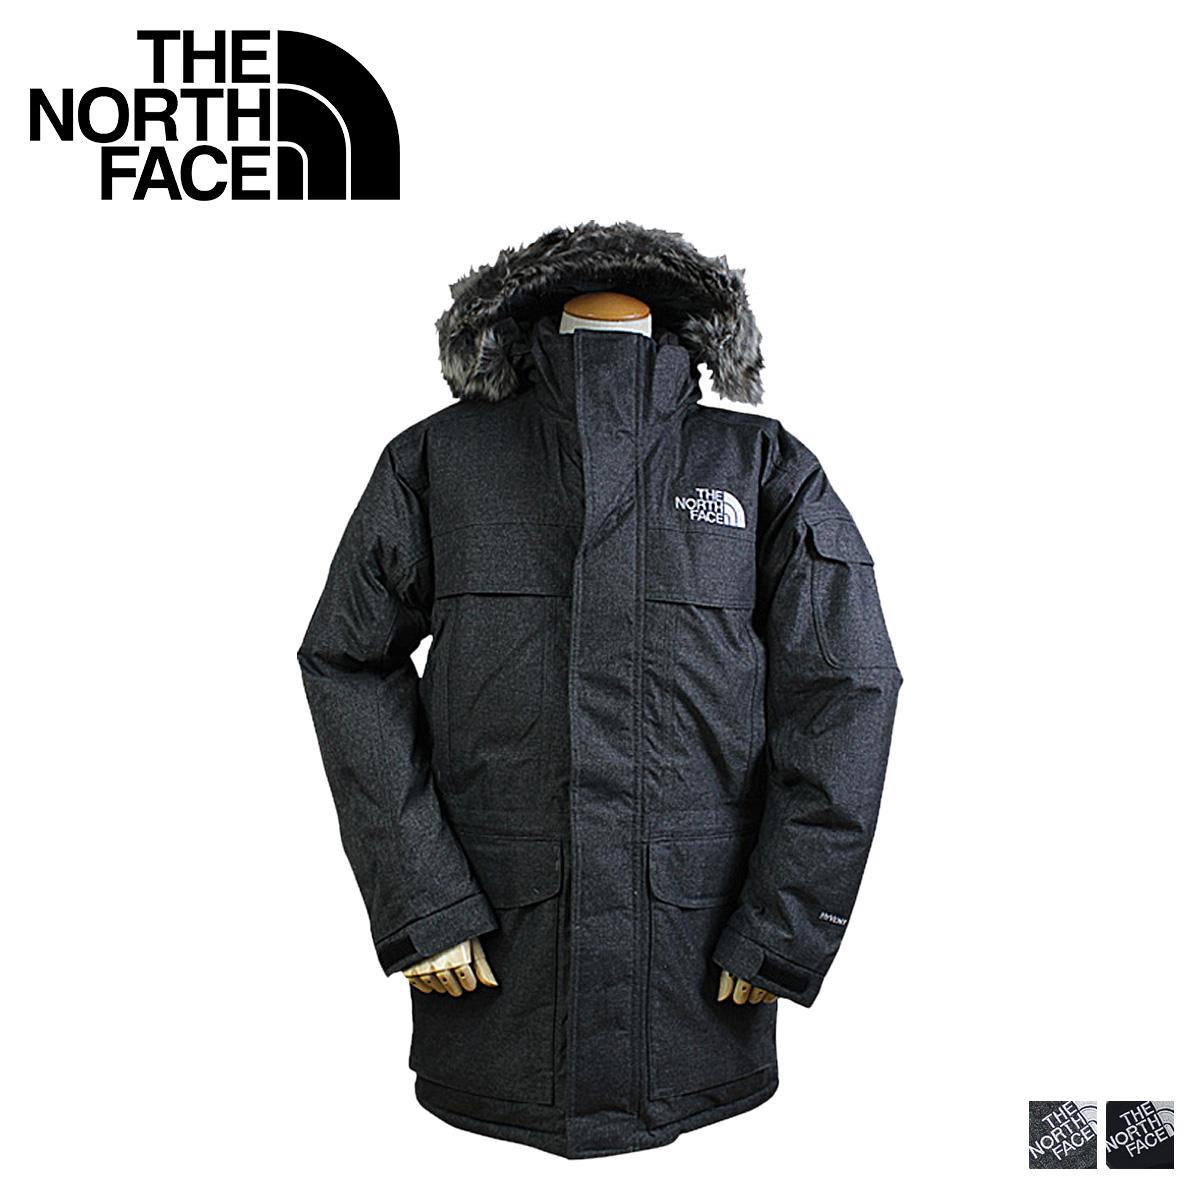 5ce0d9c24 North Face THE NORTH FACE mountain parka black black gray A8XZ MCMURDO  PARKA men